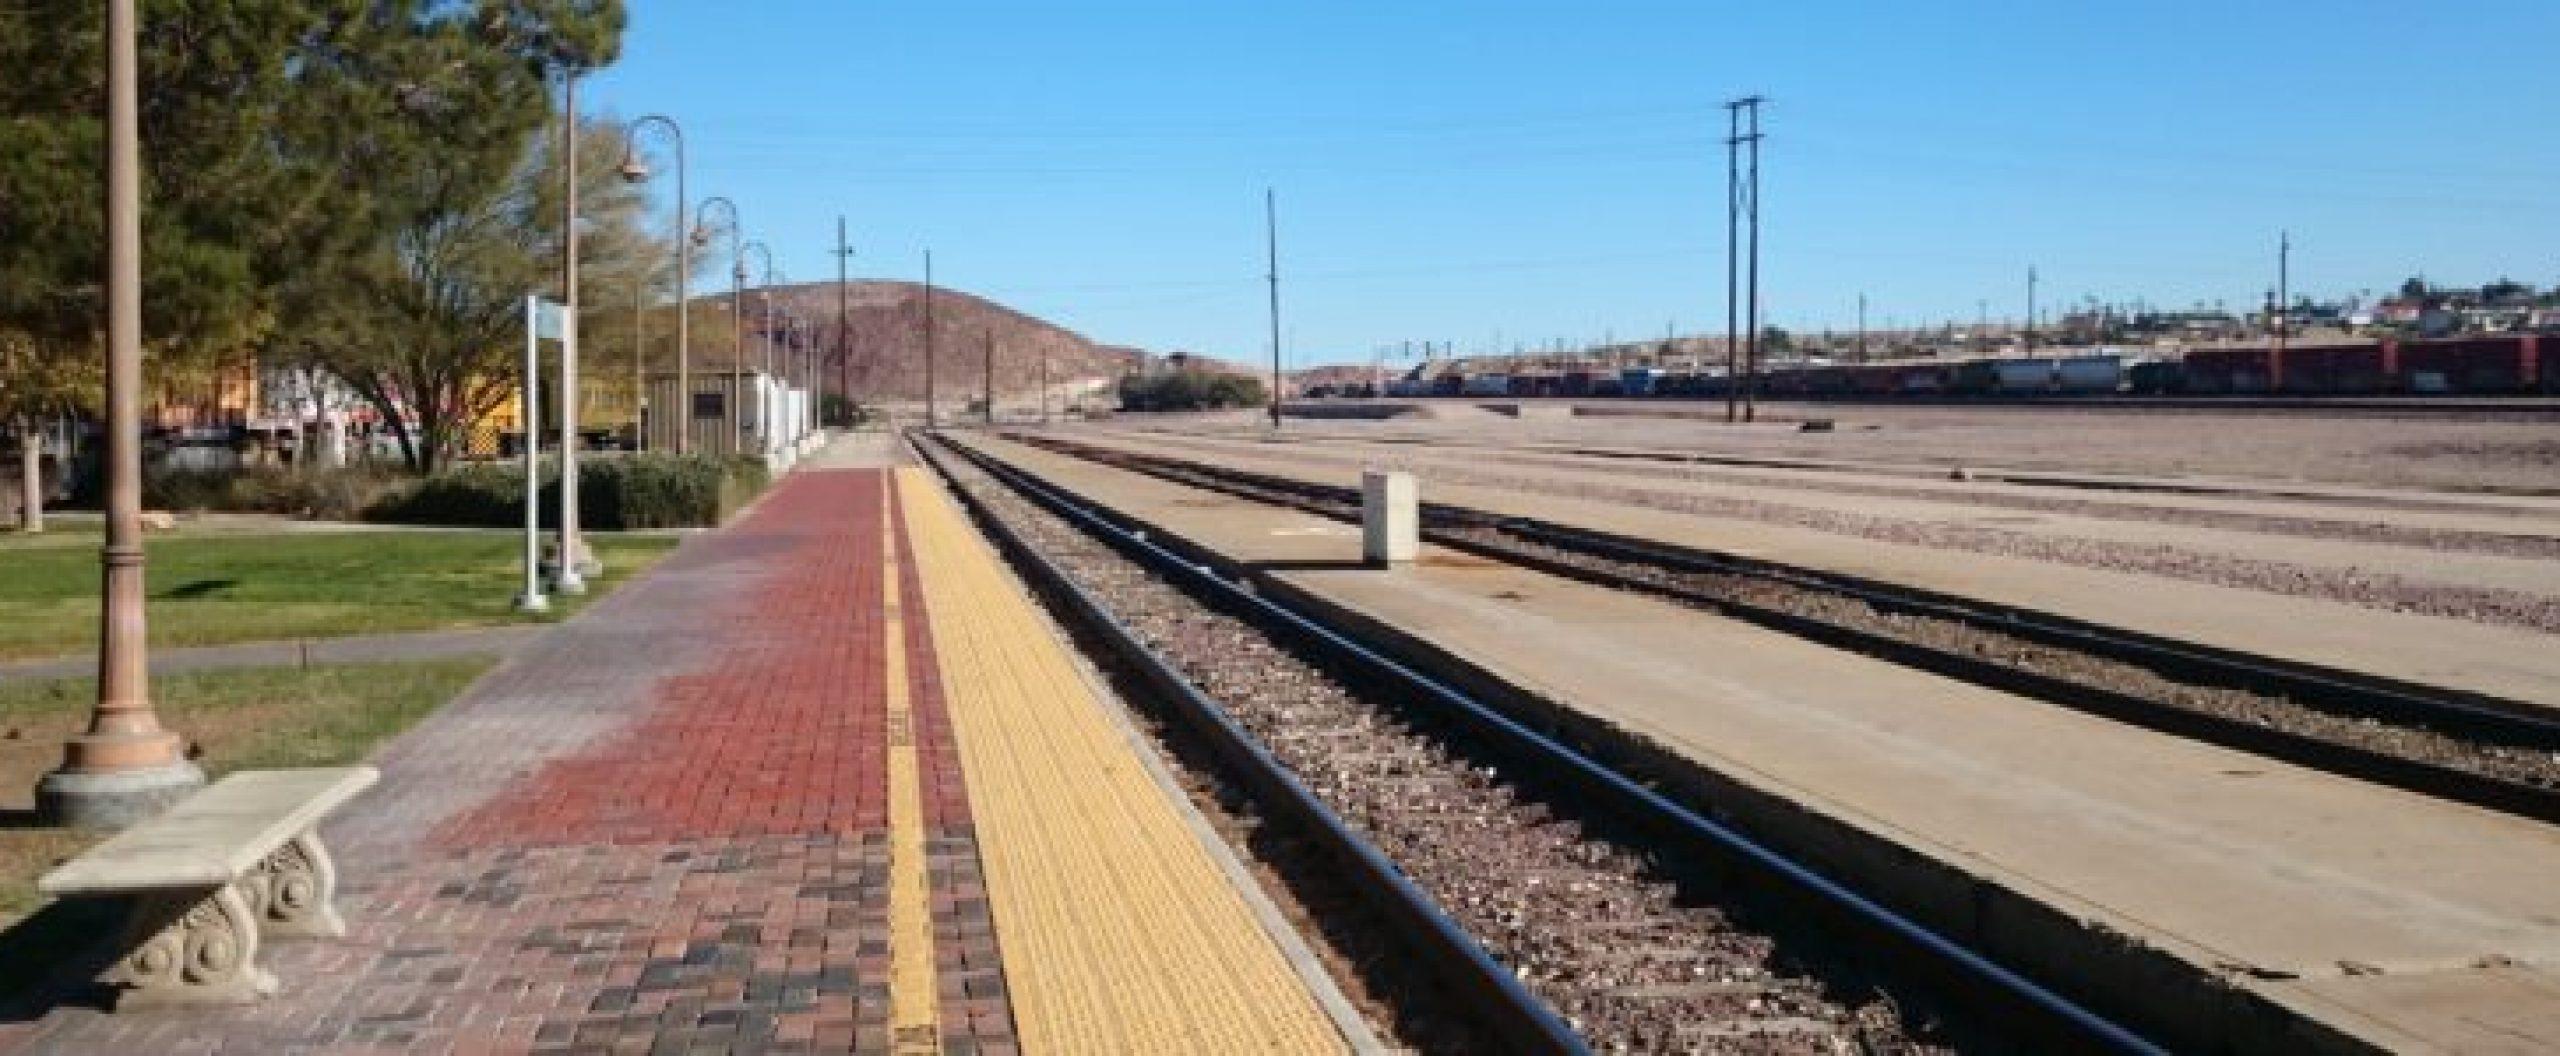 Barstow Station, California